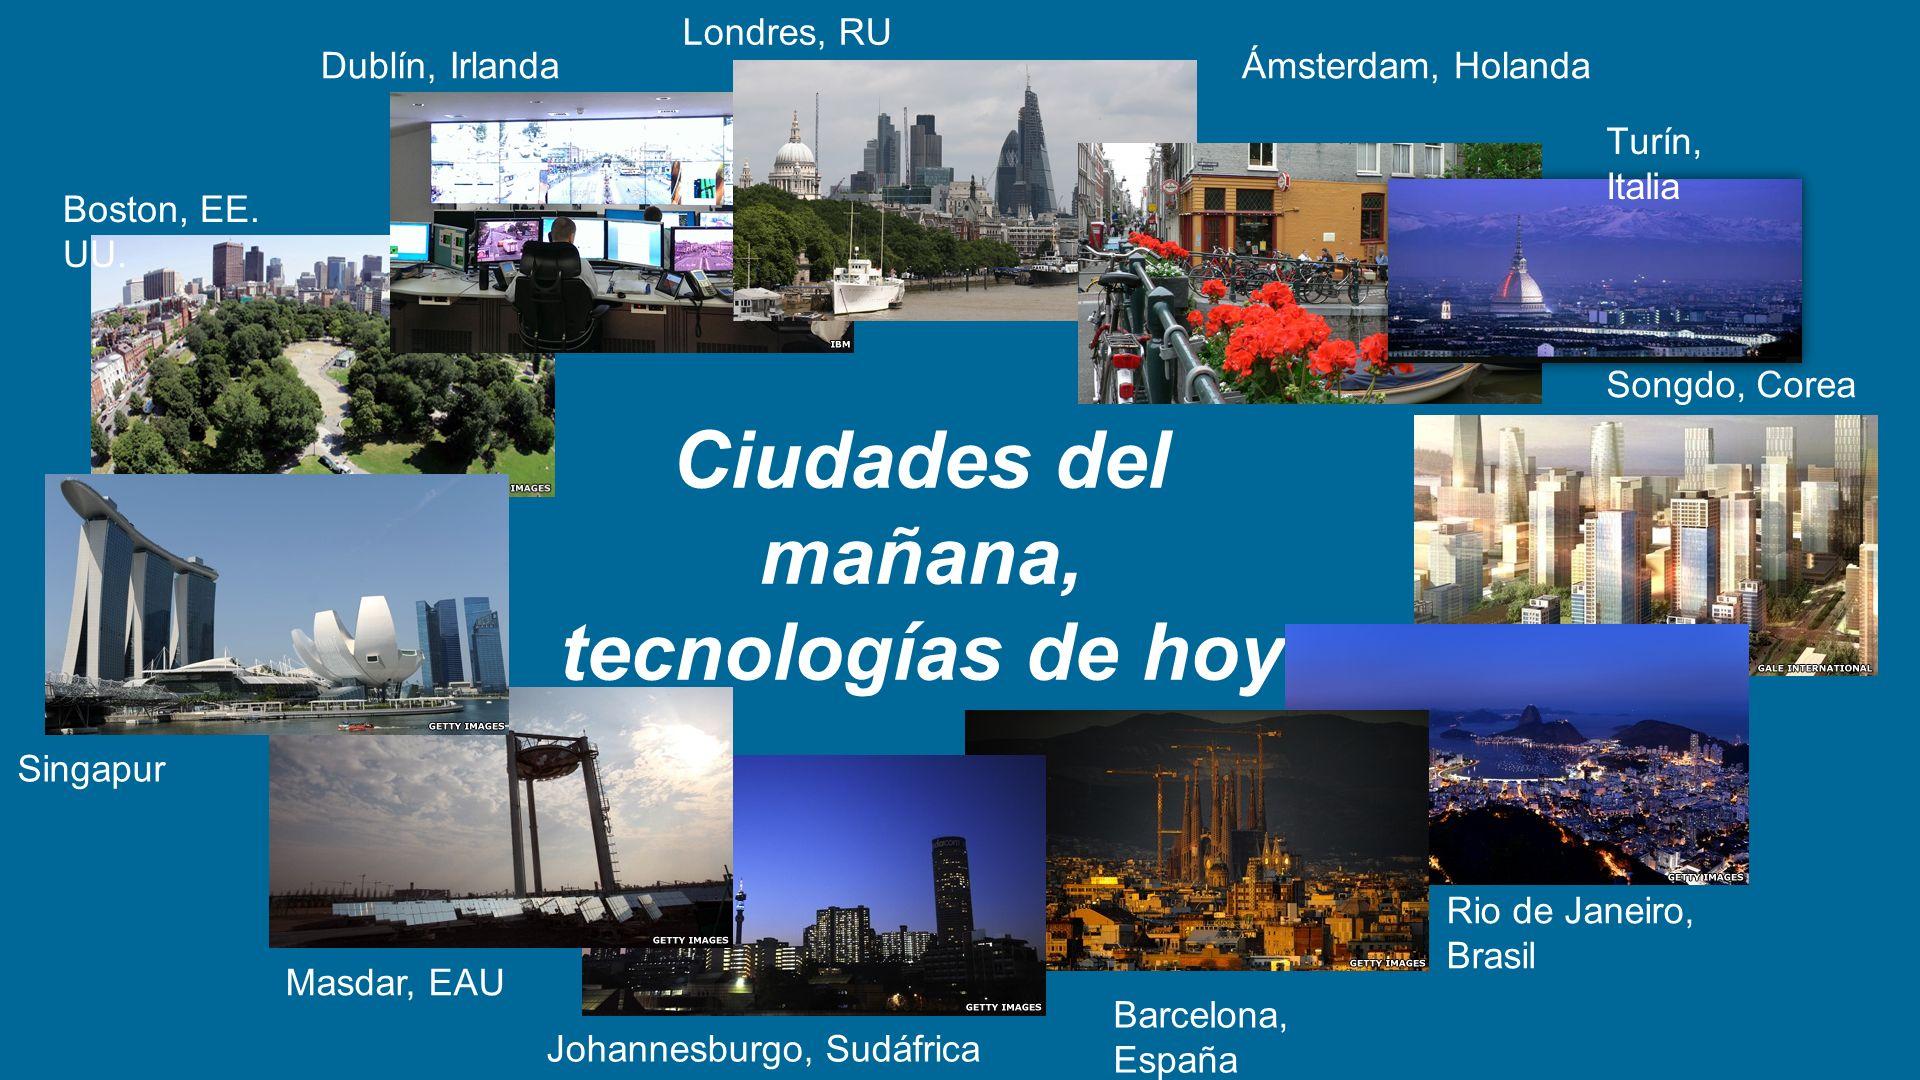 Ciudades del mañana, tecnologías de hoy Boston, EE. UU. Songdo, Corea Londres, RU Ámsterdam, HolandaDublín, Irlanda Rio de Janeiro, Brasil Barcelona,